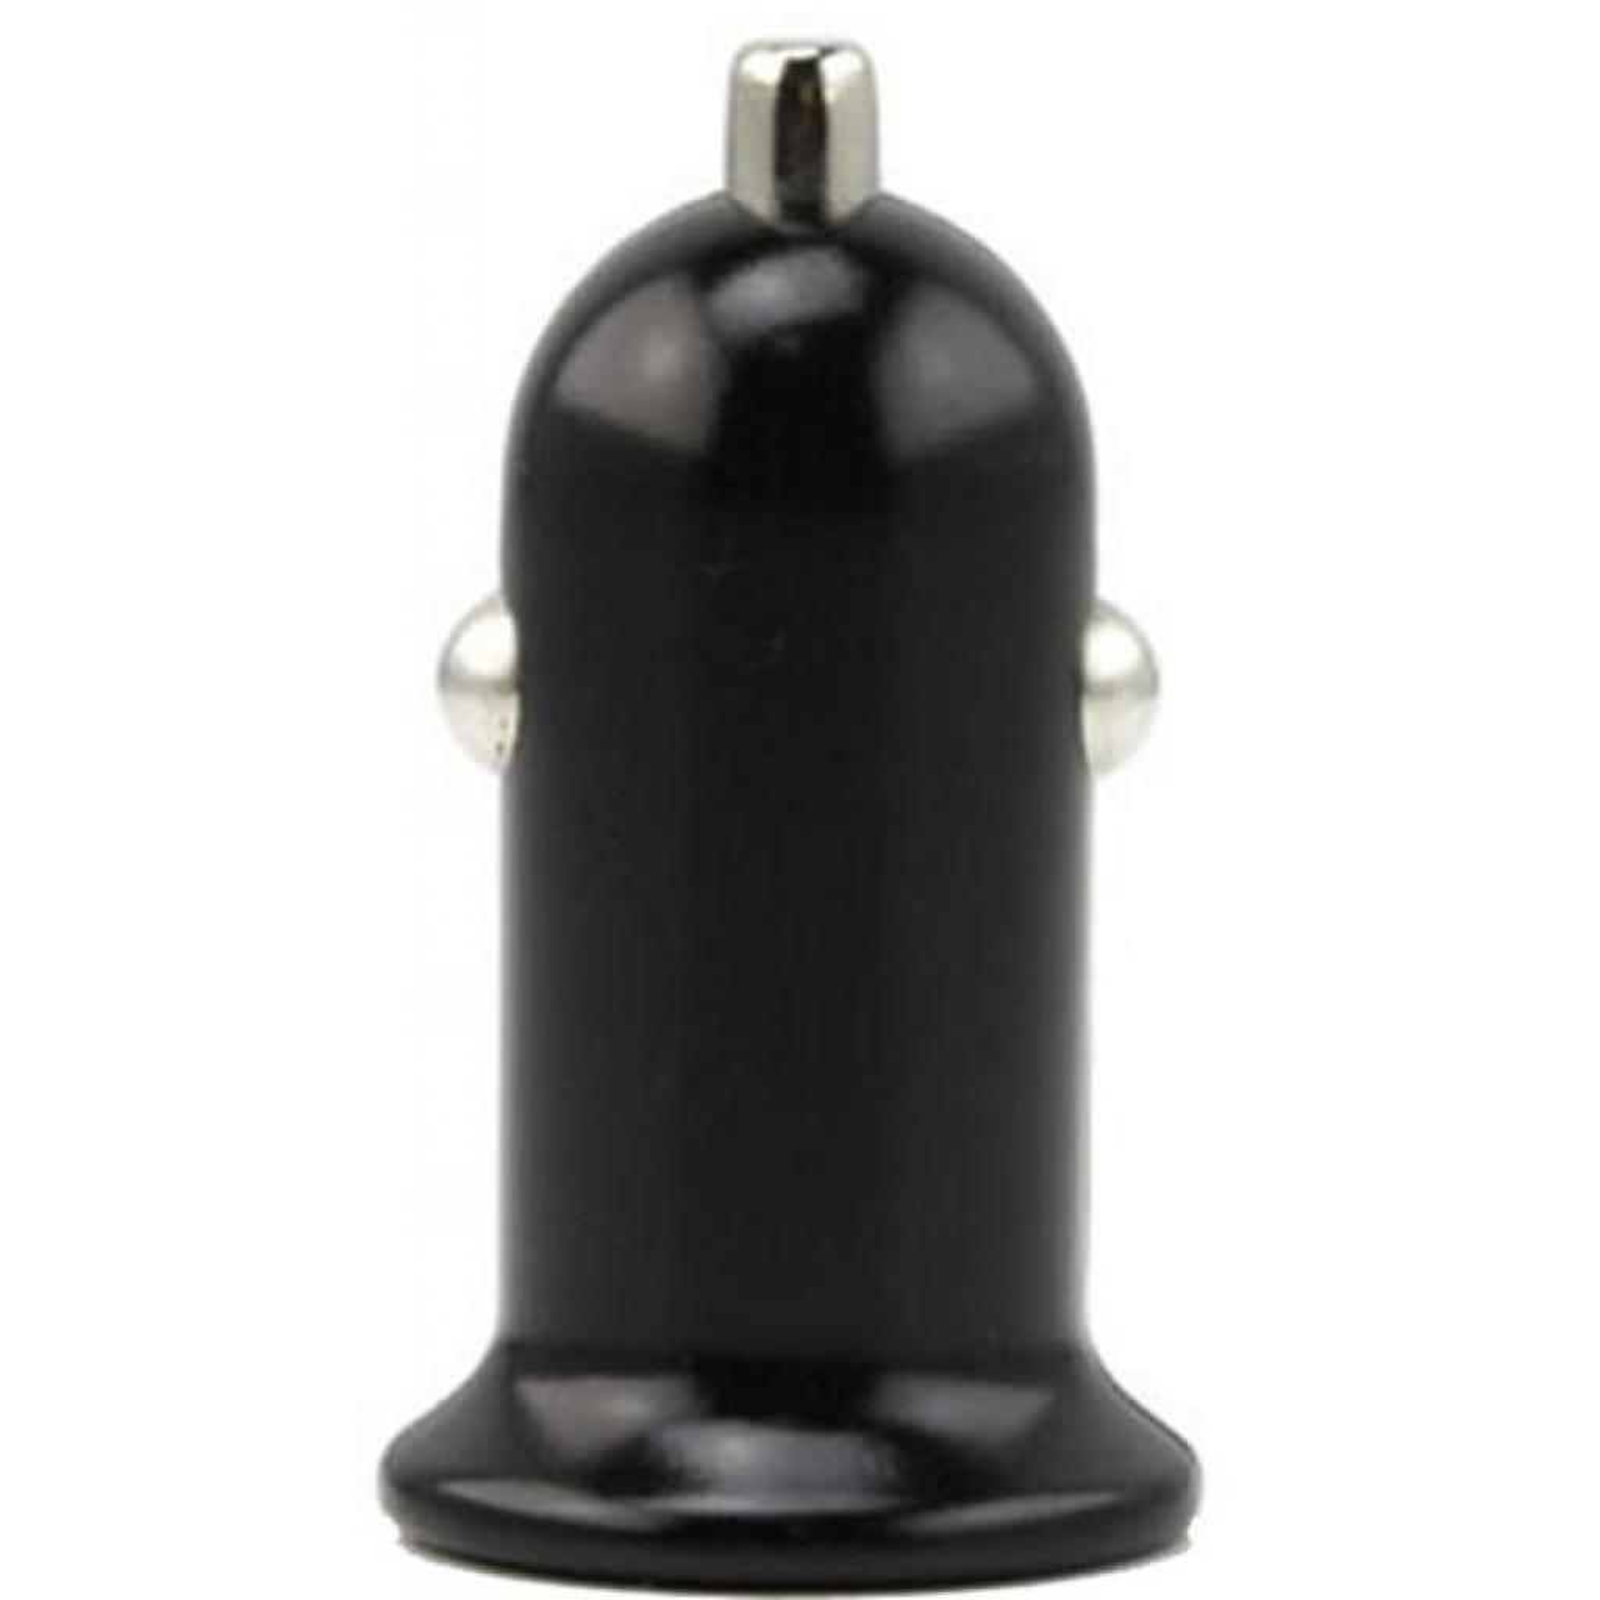 Зарядное устройство JCPAL Star 1*USB, 2.4A (JCP6005) изображение 5